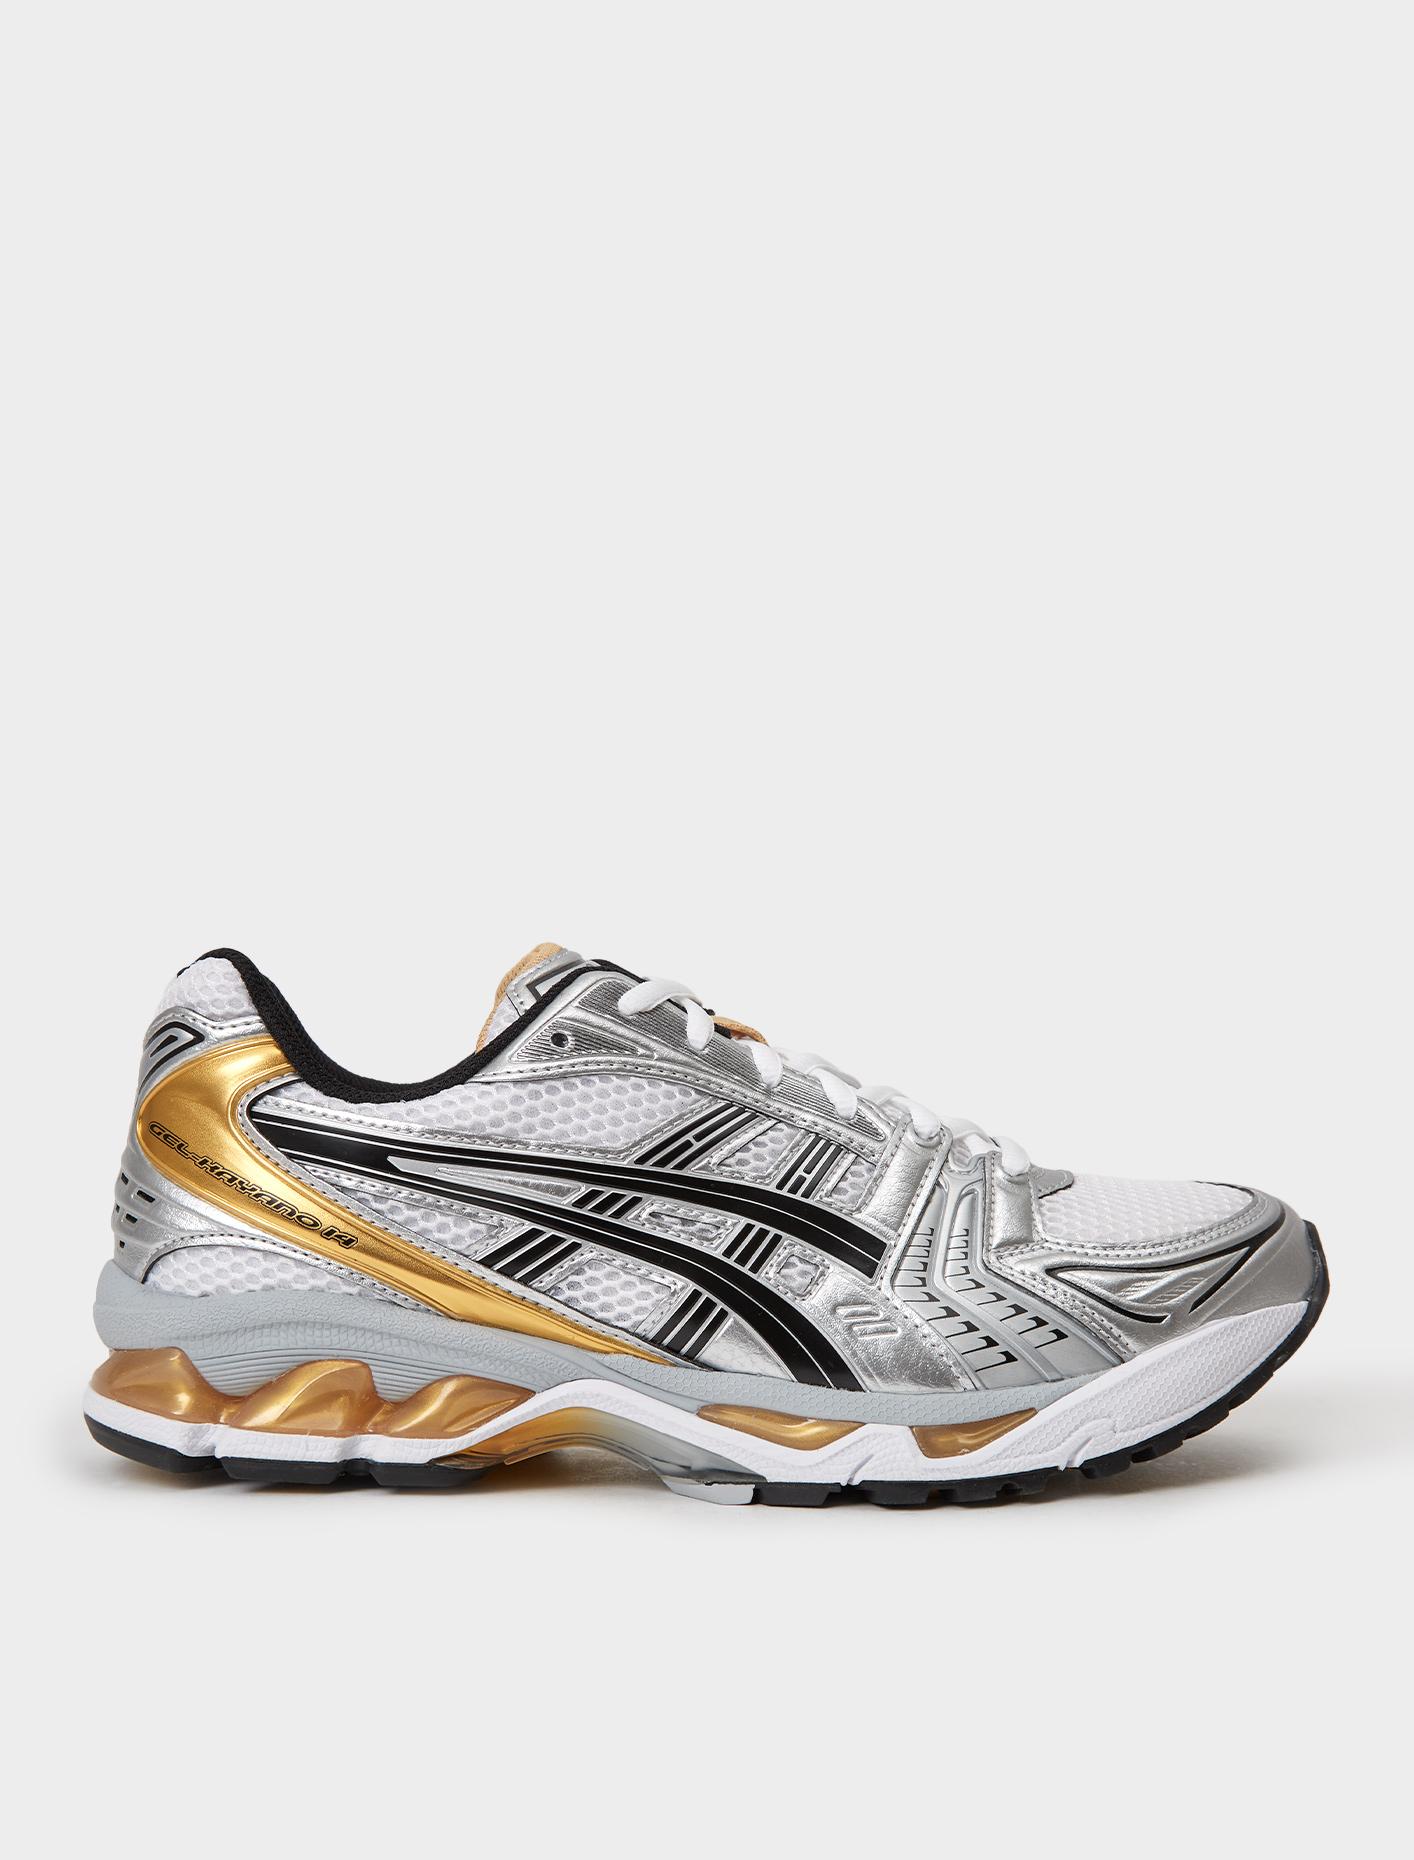 por otra parte, Correa Correspondiente  Asics GEL-KAYANO 14 Sneaker in White/Pure Gold | Voo Store Berlin |  Worldwide Shipping